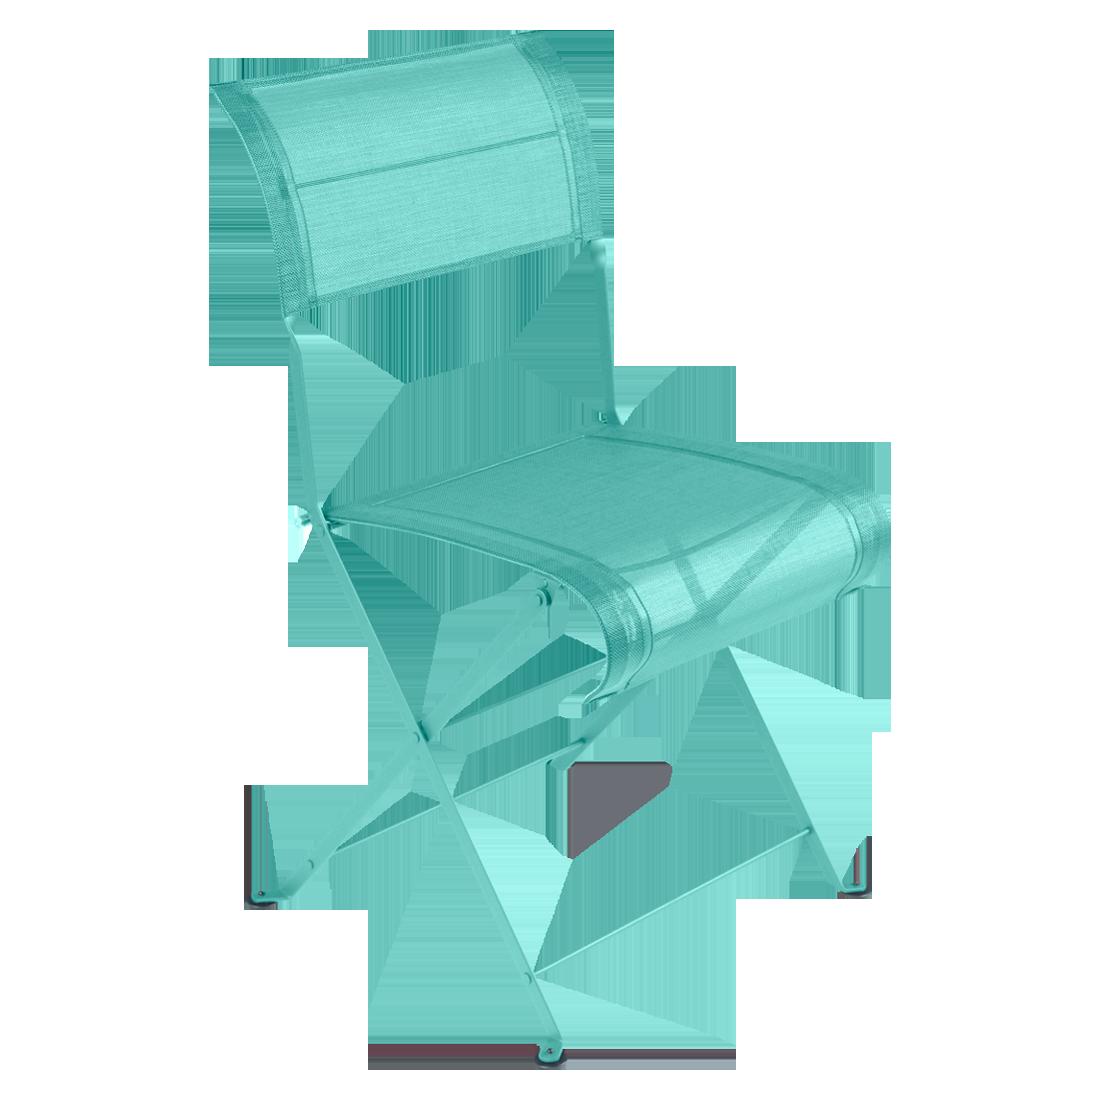 Chaise Pliante DUNE PREMIUM De Fermob Bleu Lagune